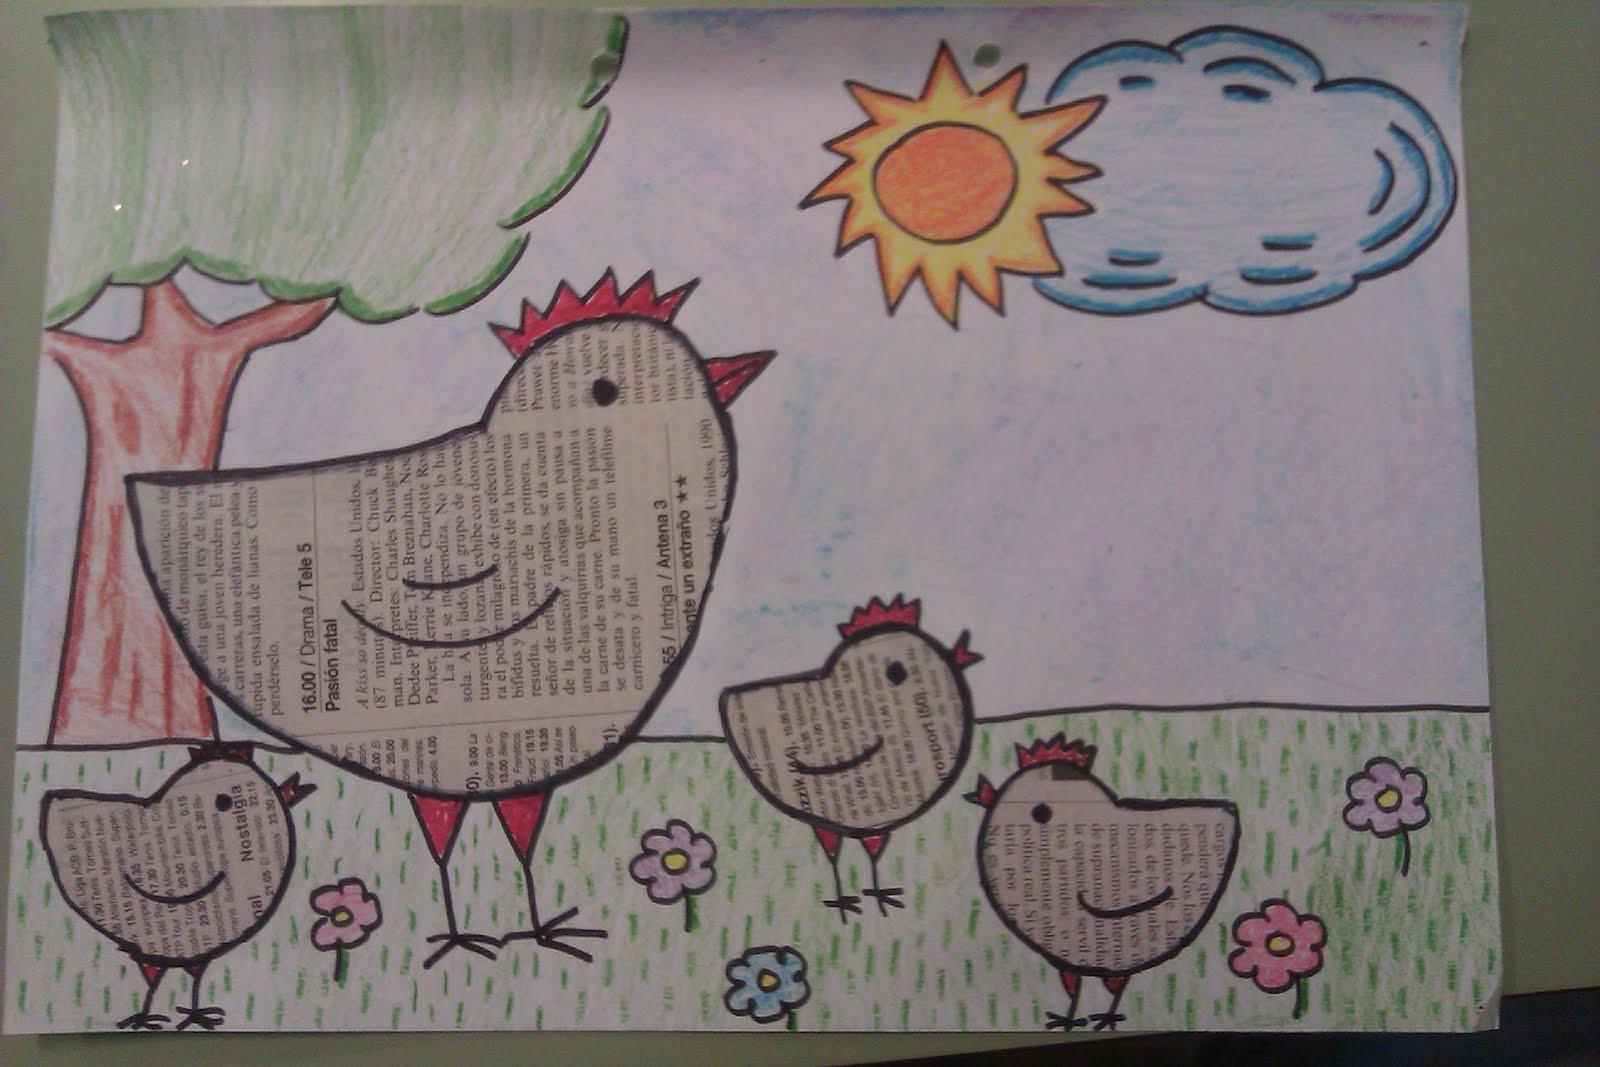 Manualidades escolares dibujos con peri dico - Manualidades con periodicos para ninos ...